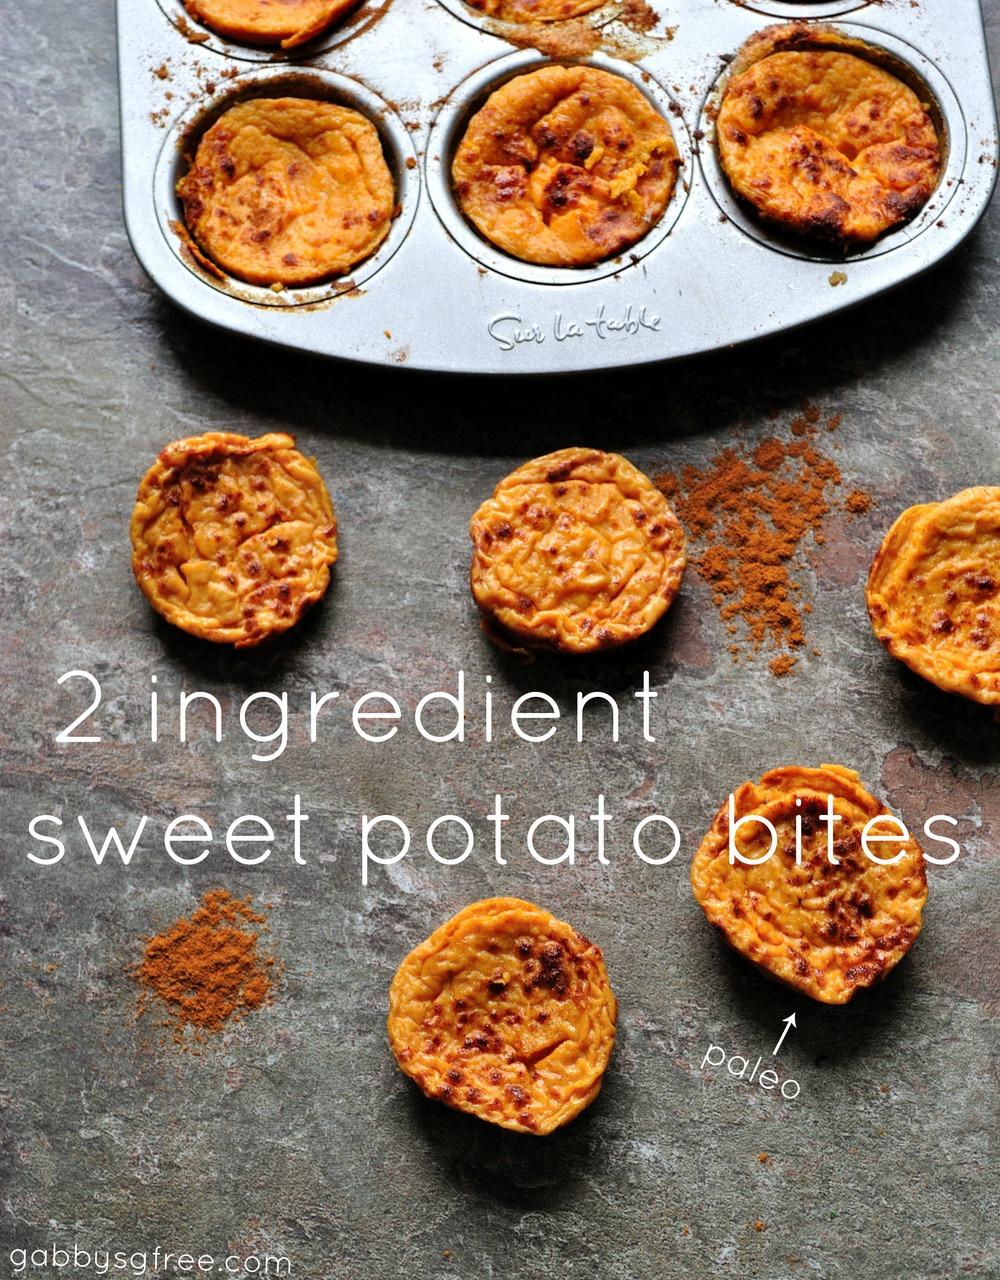 sweetpotatobites.jpg